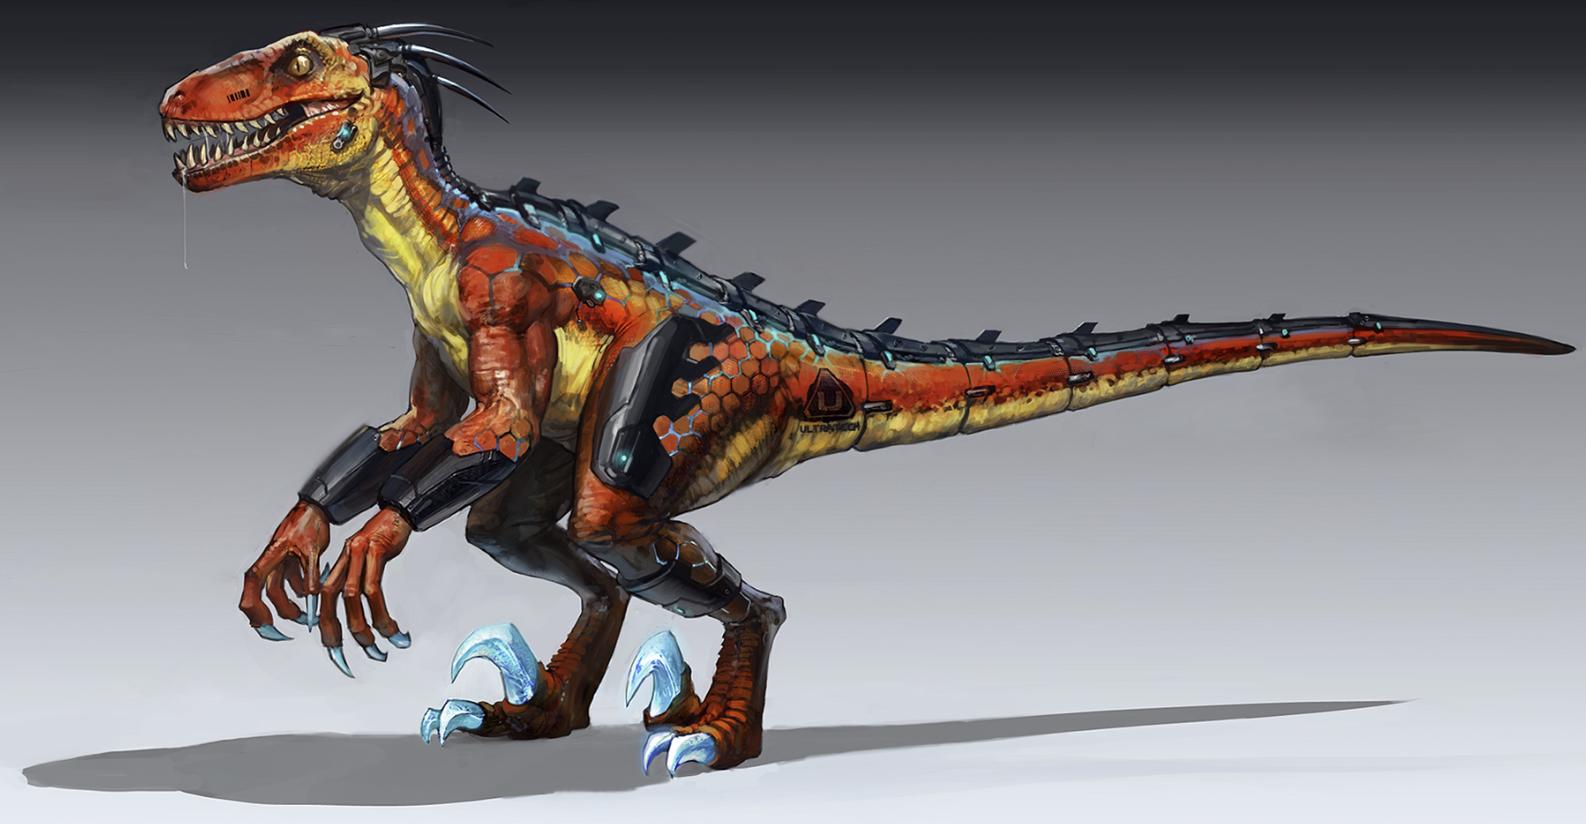 Http Www Killerinstinctcentral Com Wp Content Uploads 2014 12 Ki Xbox One Riptor Concept Art Png Ark Survival Evolved Instinct Lion King Fan Art